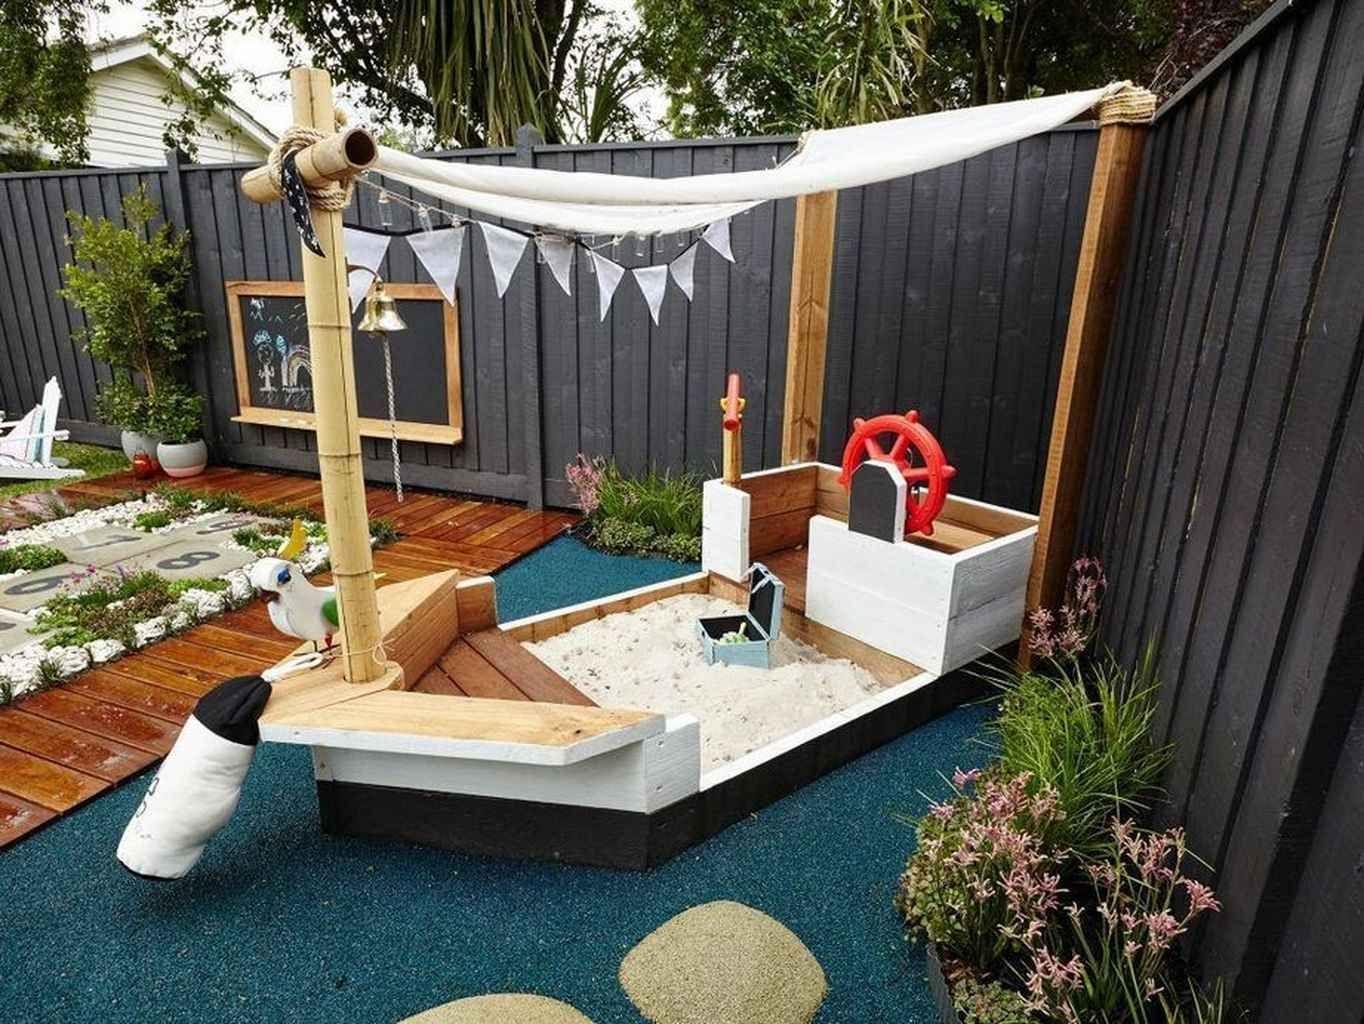 35 Fun Backyard Kids Design Ideas For Summer Outdoor Playground